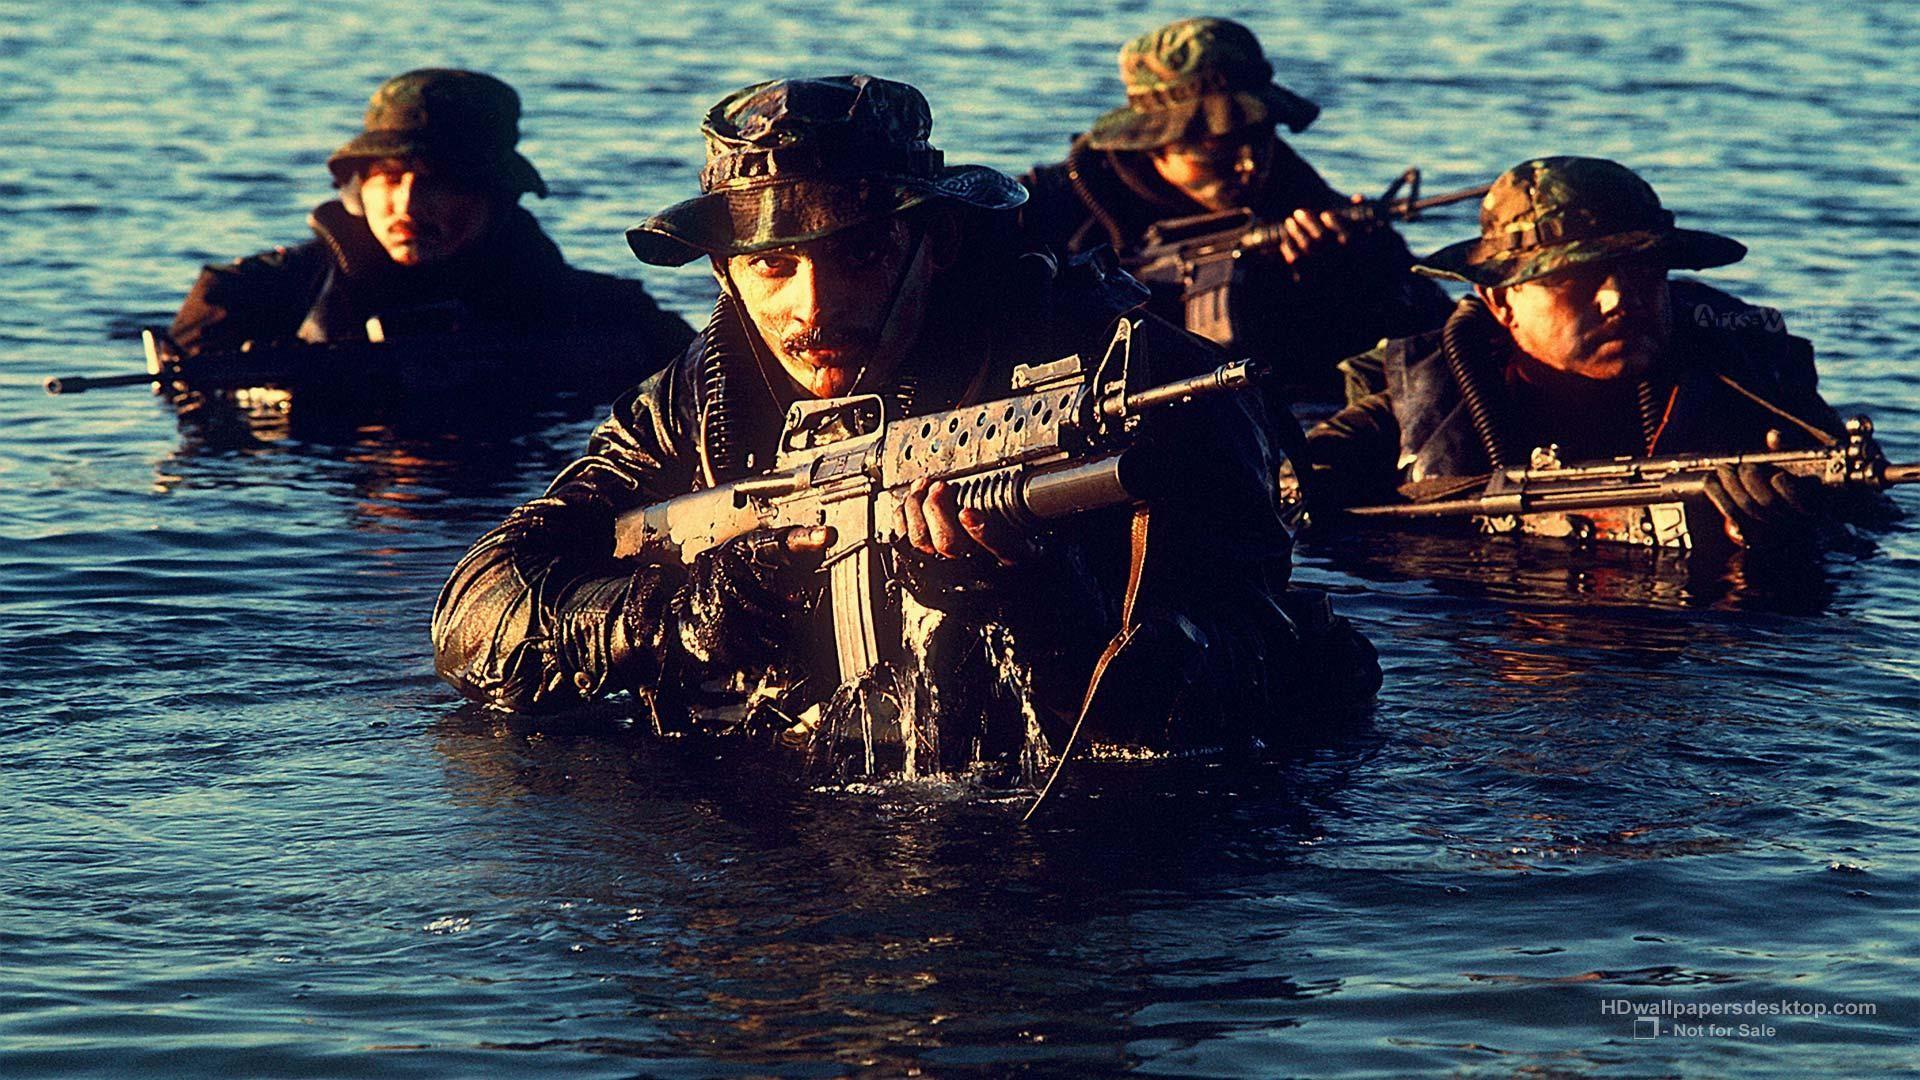 best ideas about Navy Seal Wallpaper on Pinterest Navy